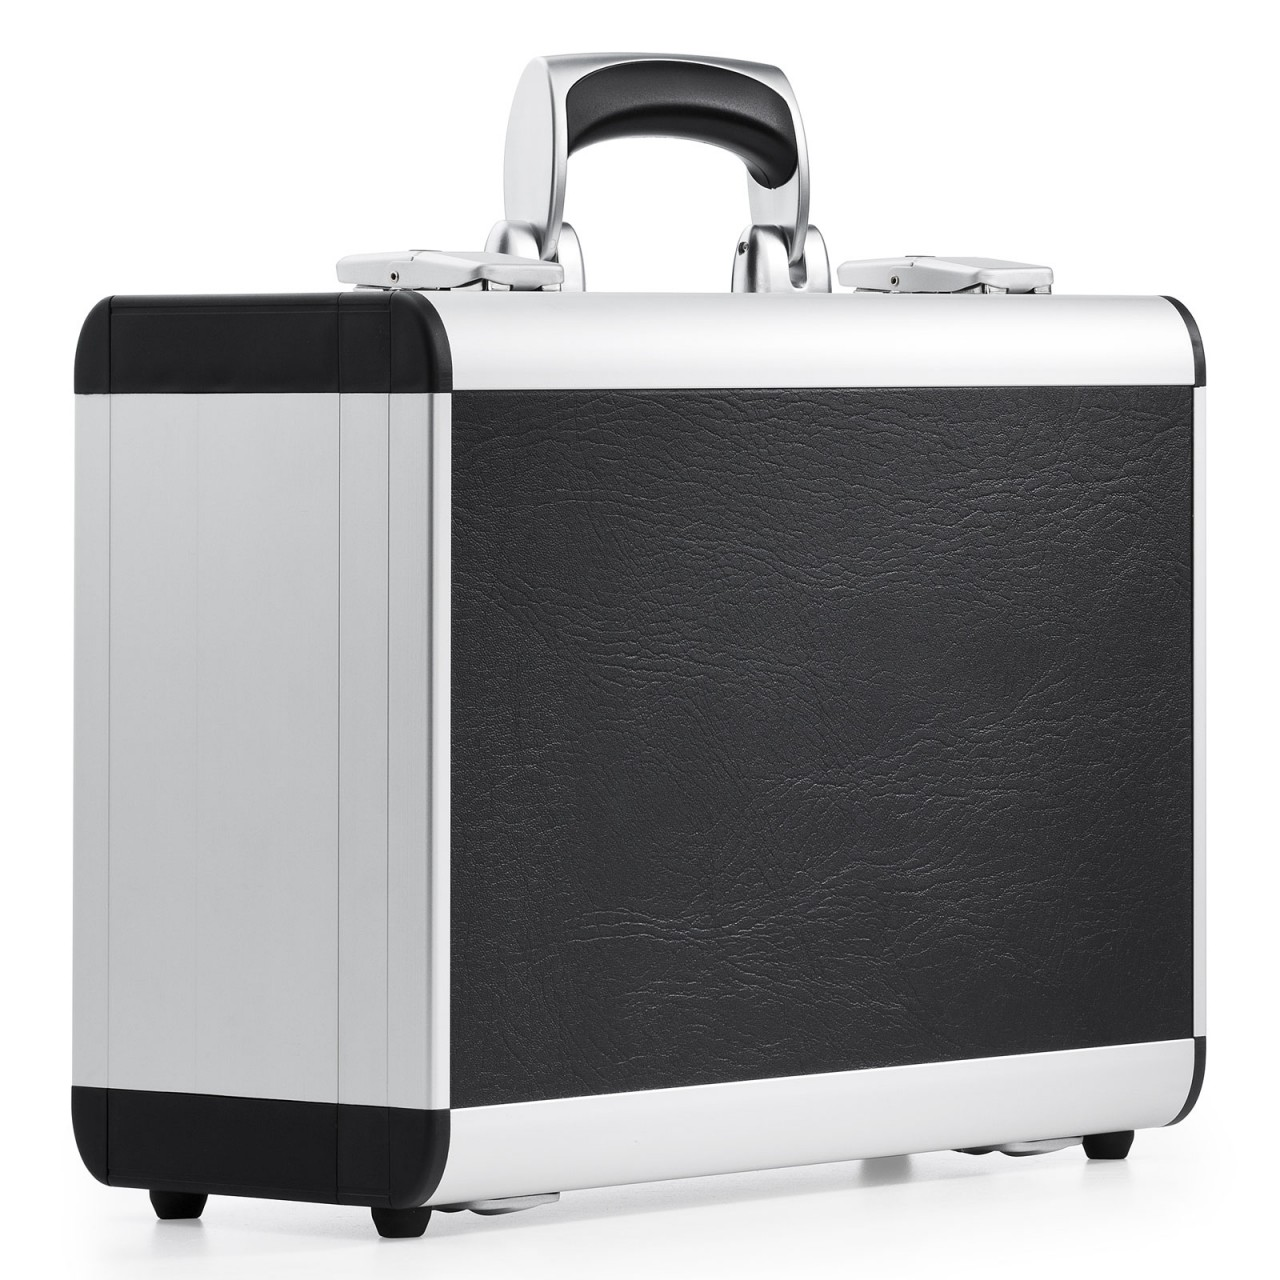 bwh koffer azkr style alukoffer typ 3 g nstig kaufen koffermarkt. Black Bedroom Furniture Sets. Home Design Ideas